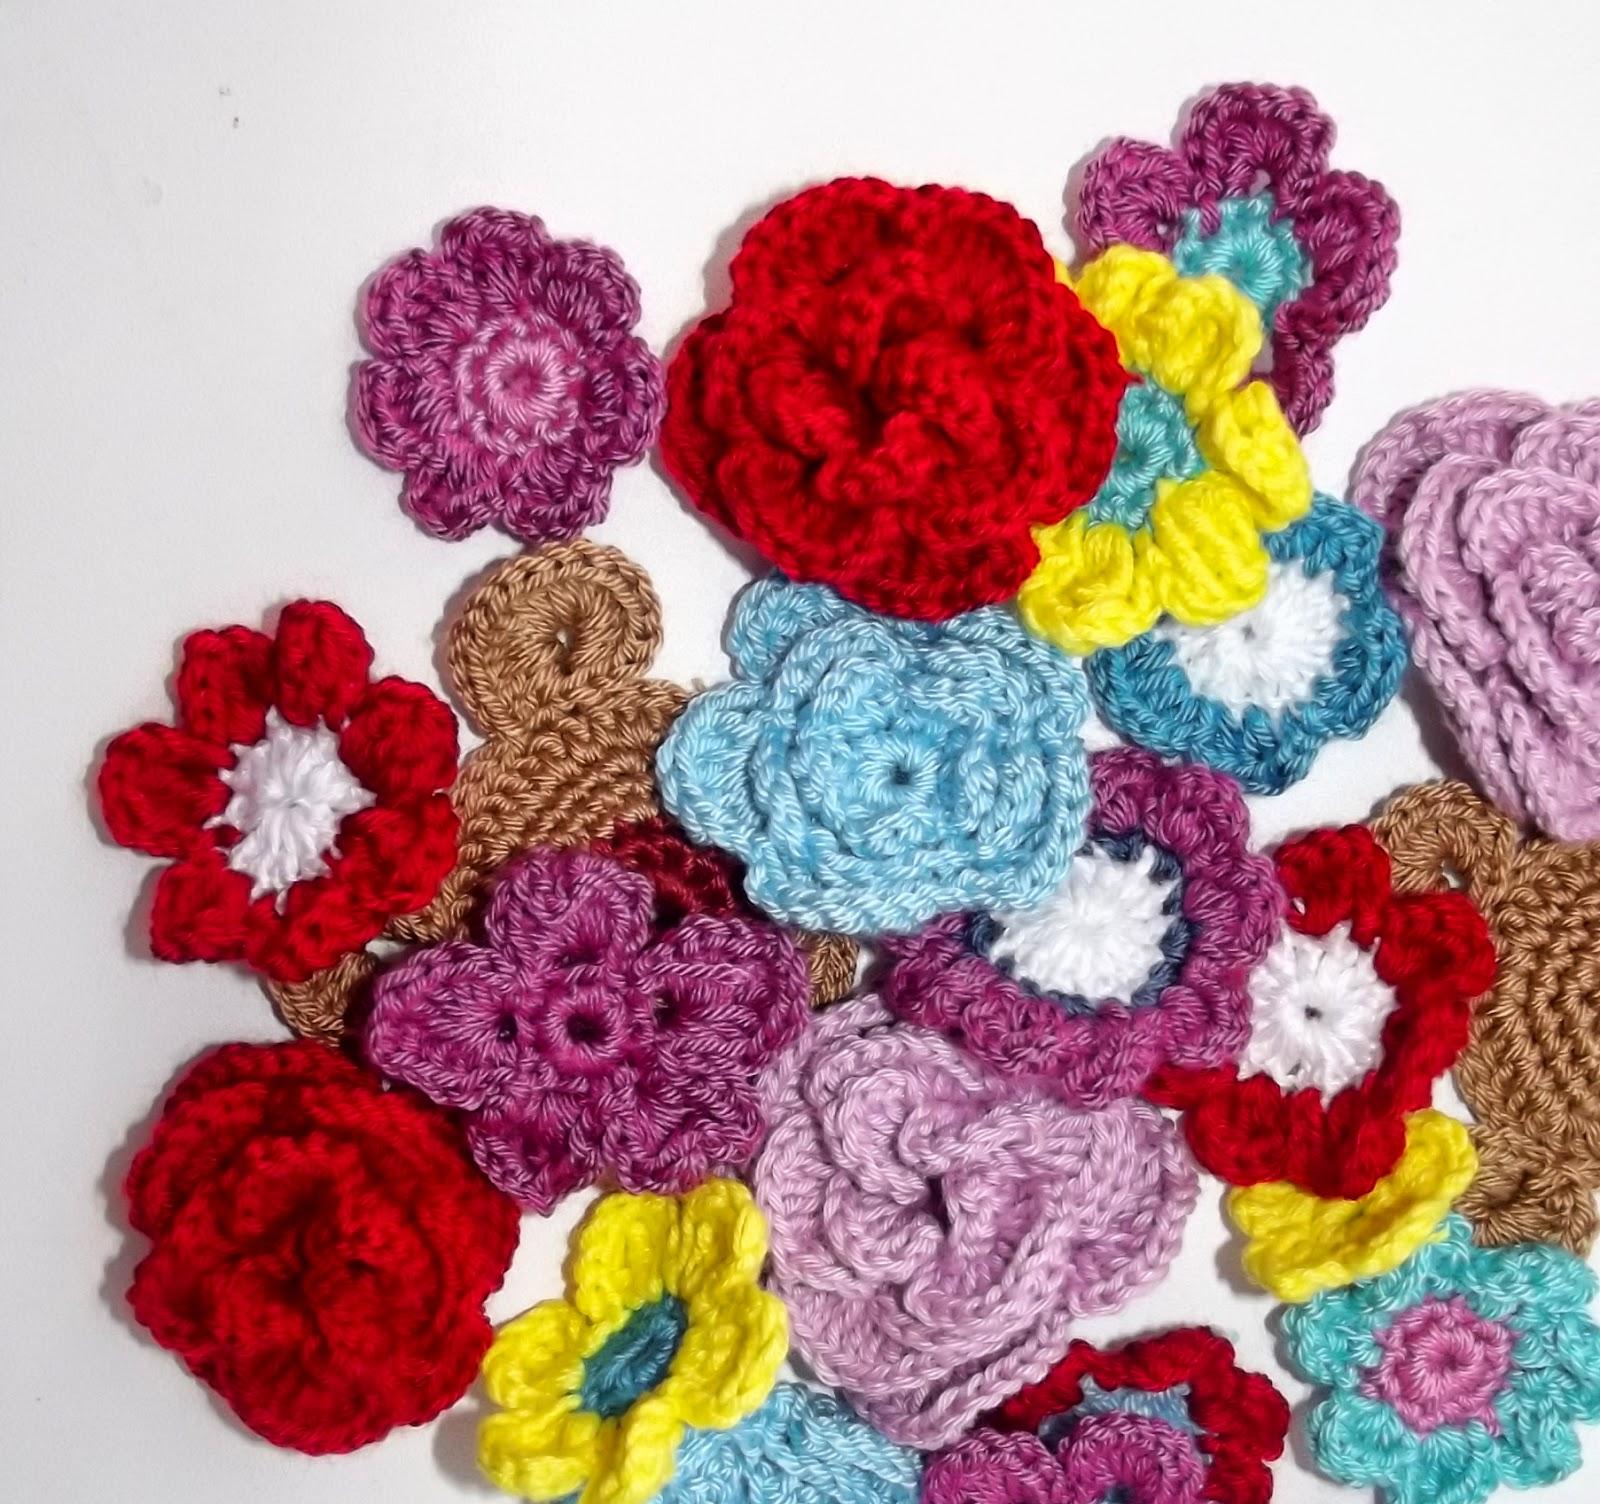 связанные крючком цветы